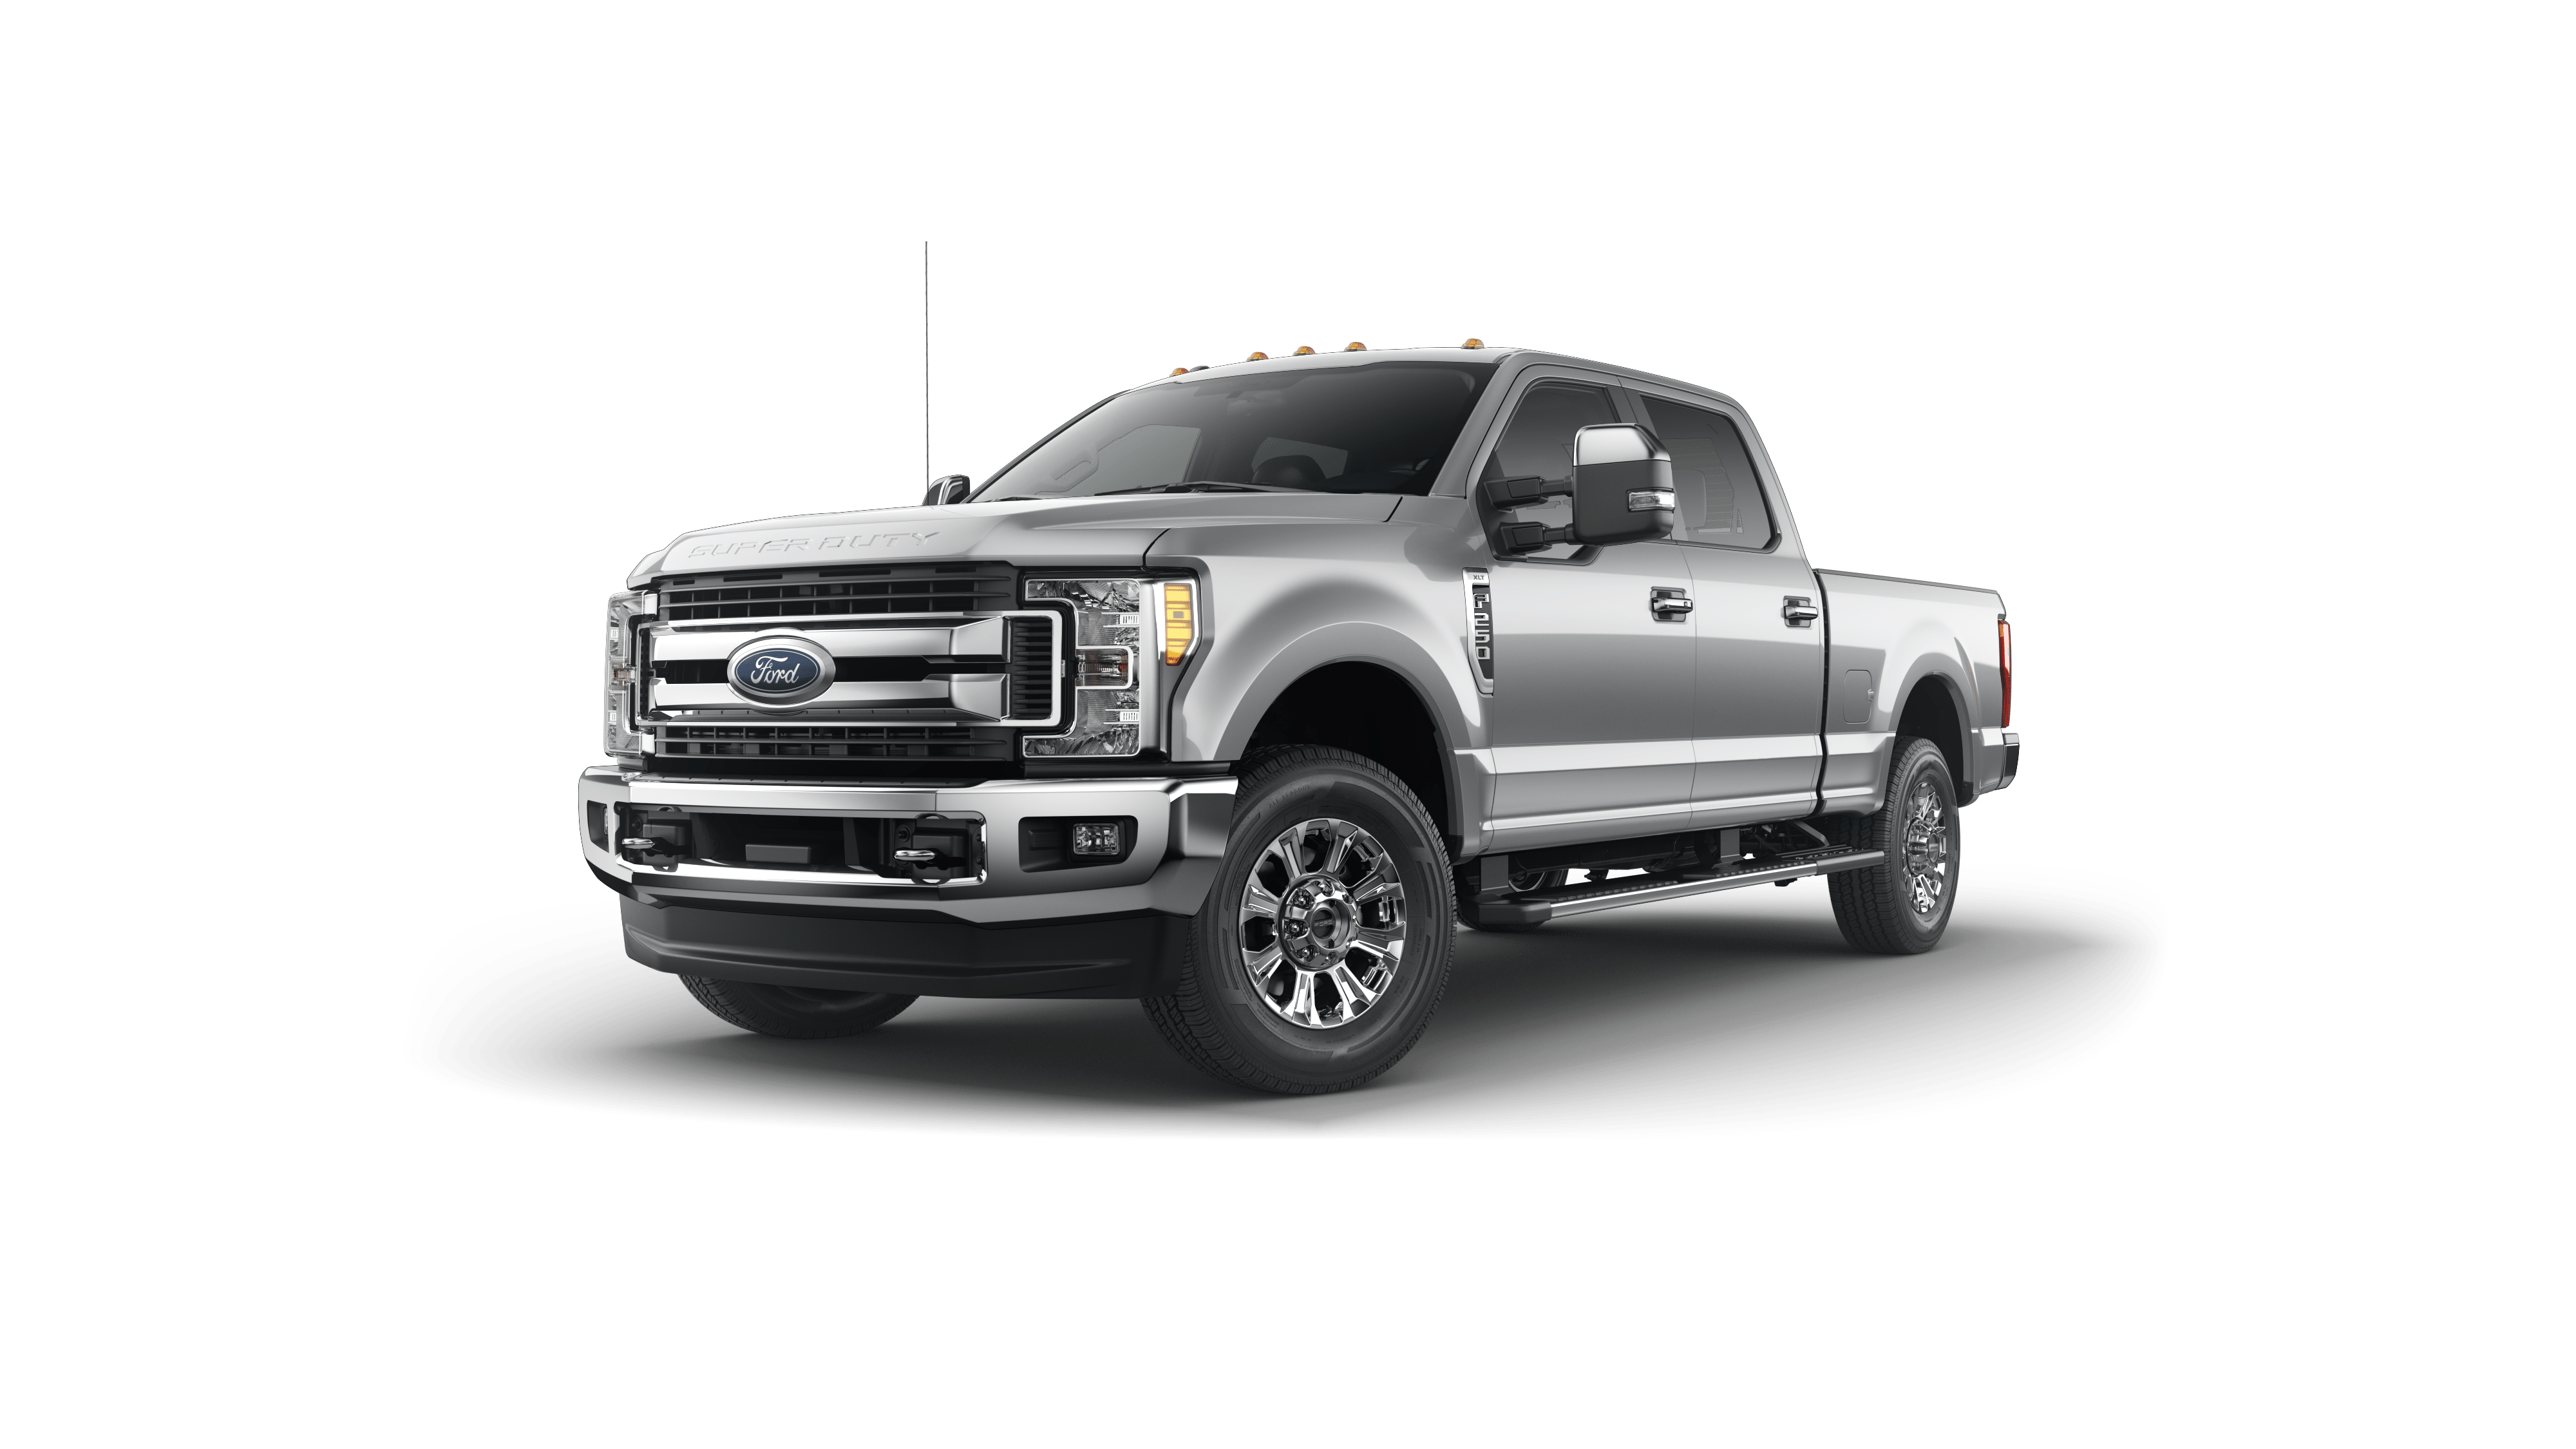 2018 Ford Super Duty F